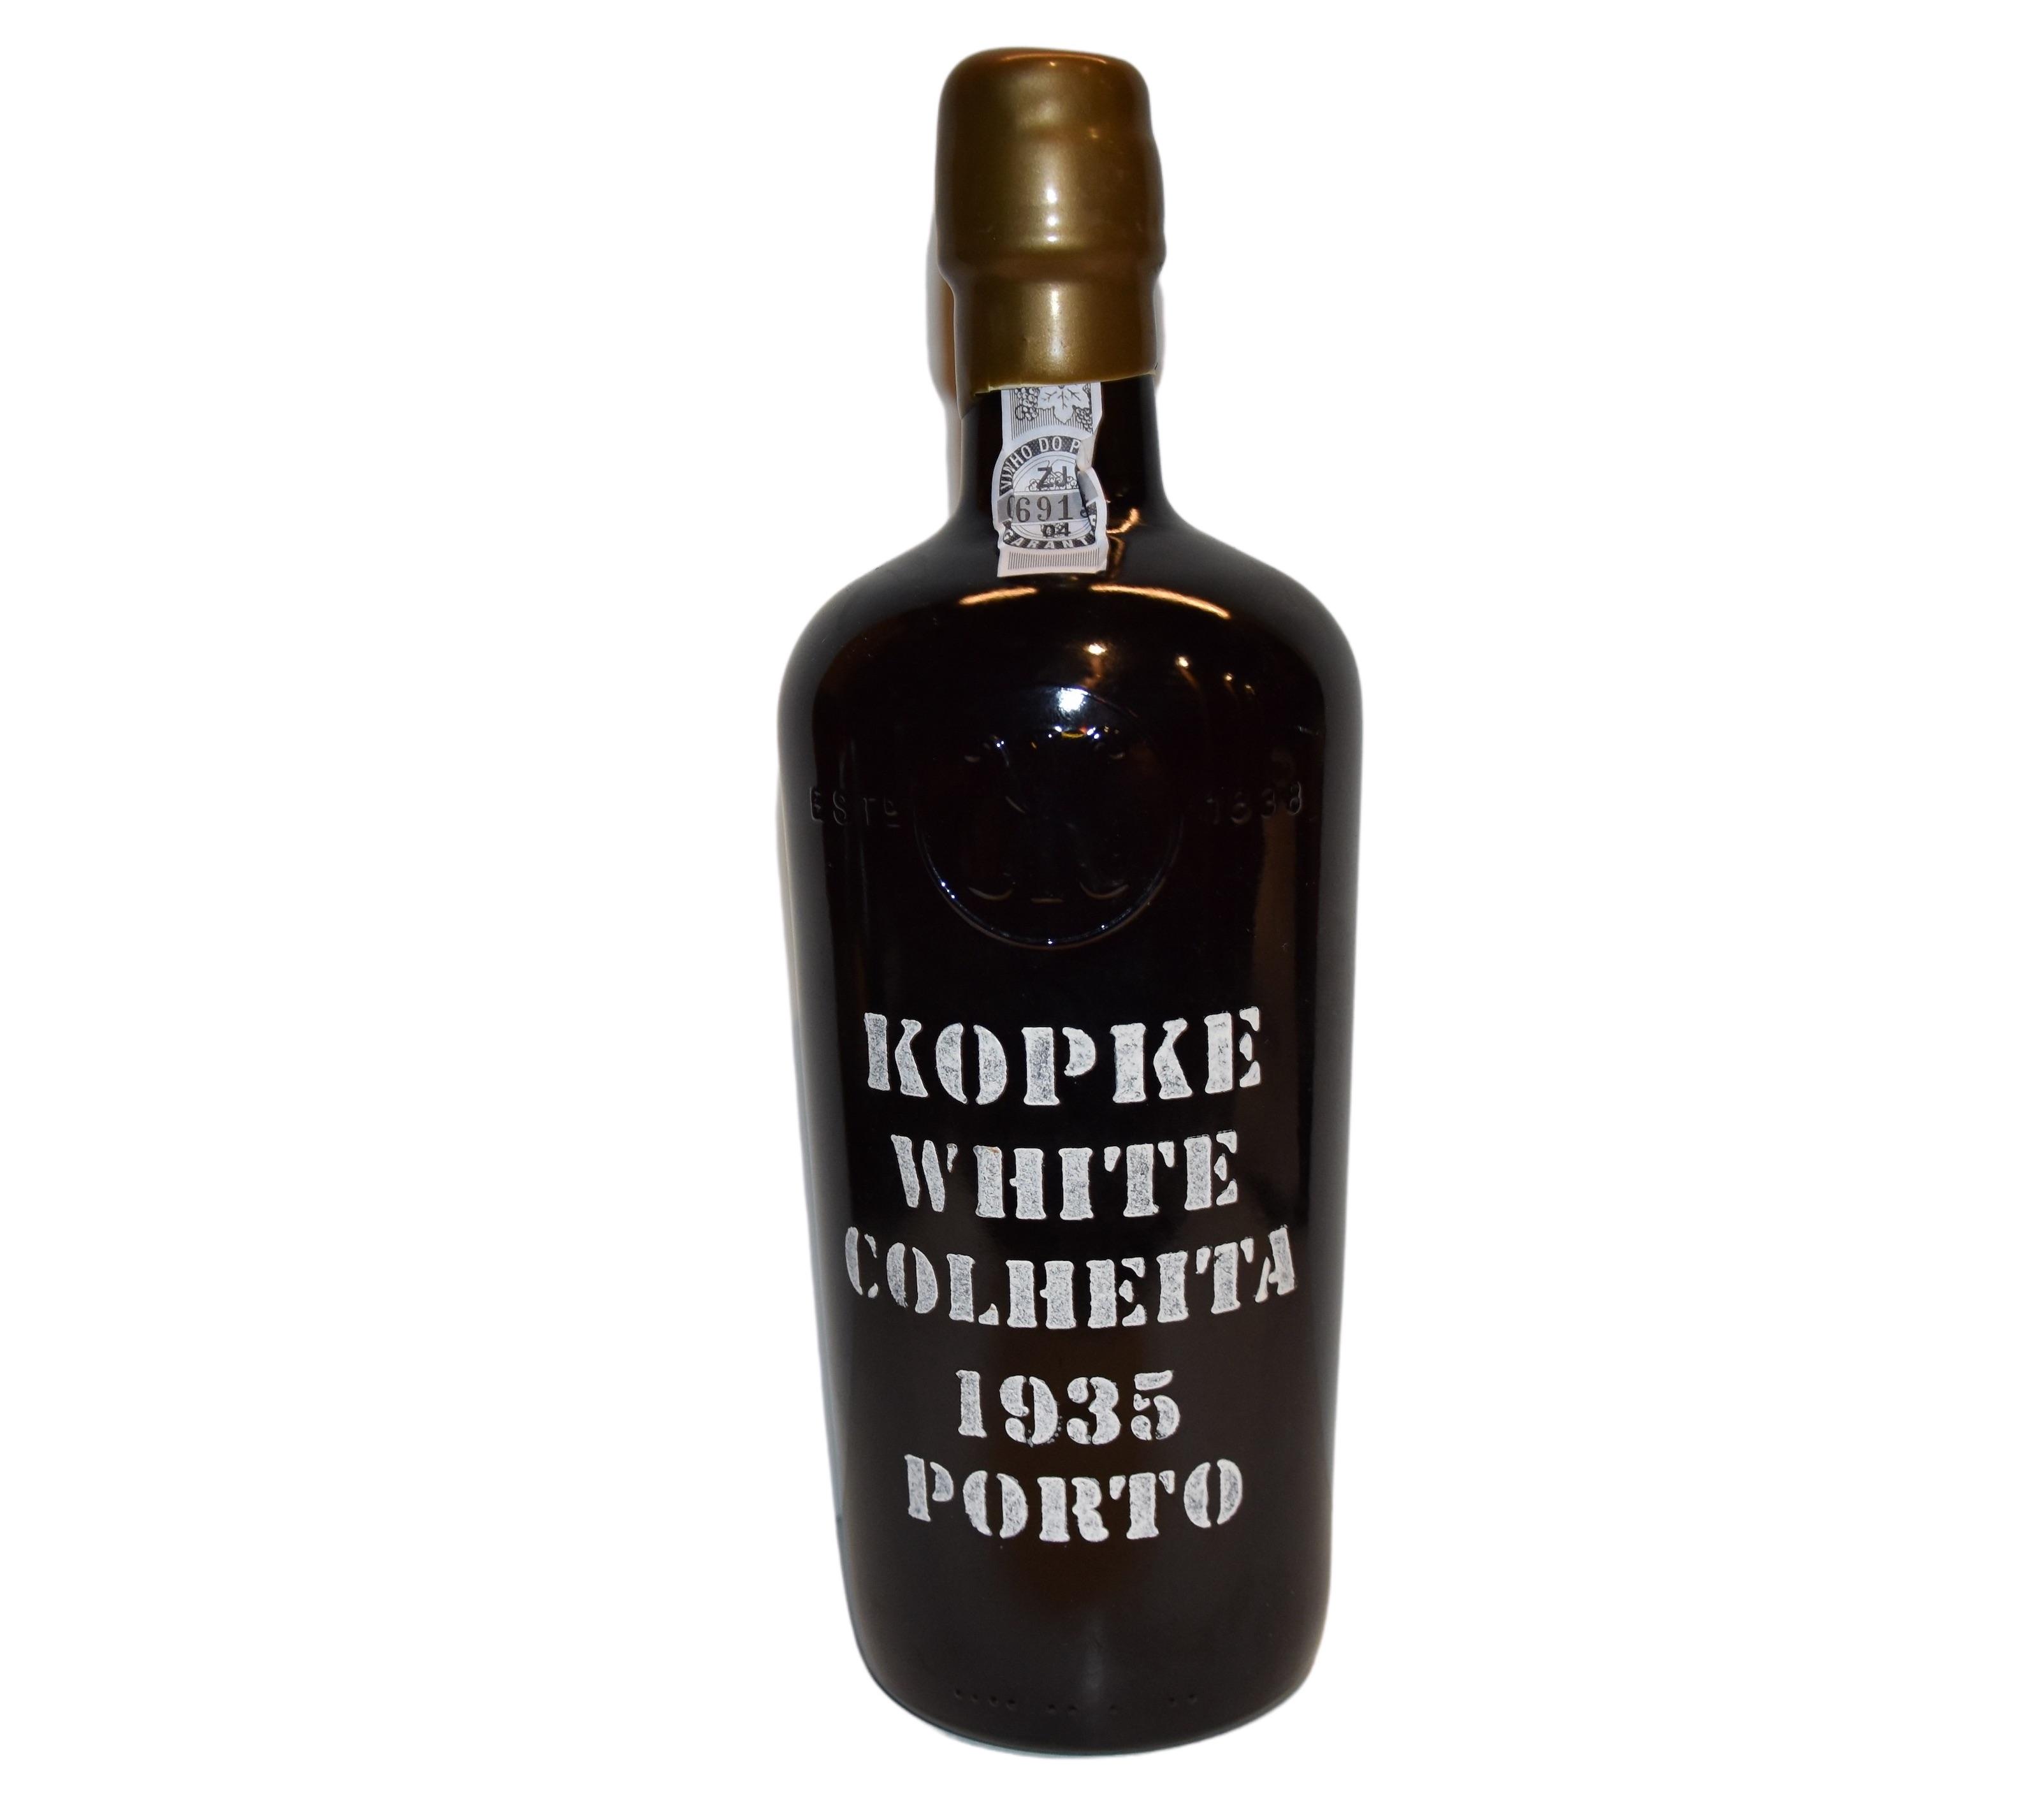 Kopke Colheita 1935